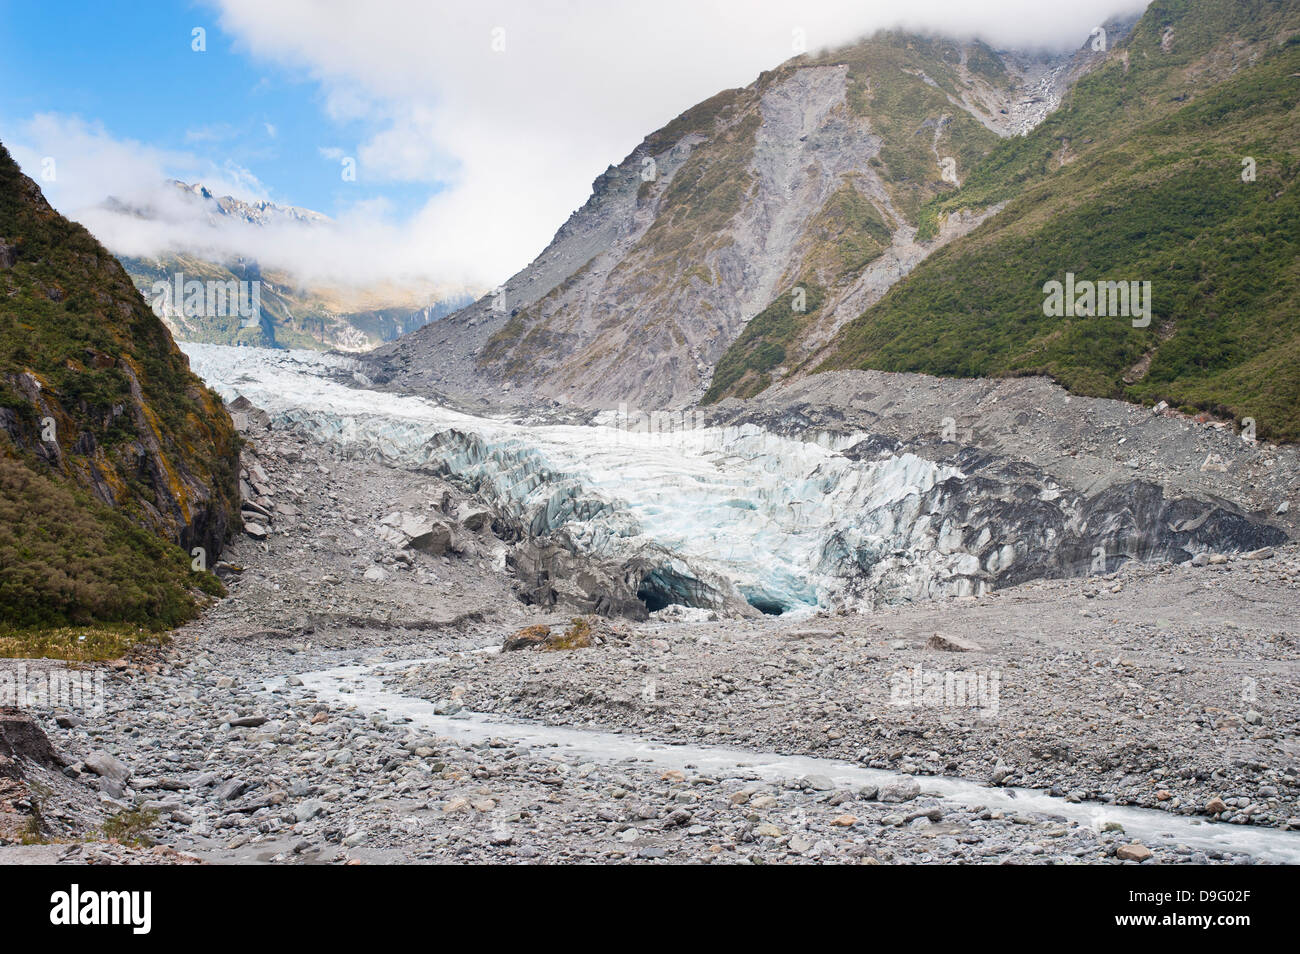 Glacier melt water river, Fox Glacier, Westland National Park, UNESCO World Heritage Site, South Island, New Zealand - Stock Image